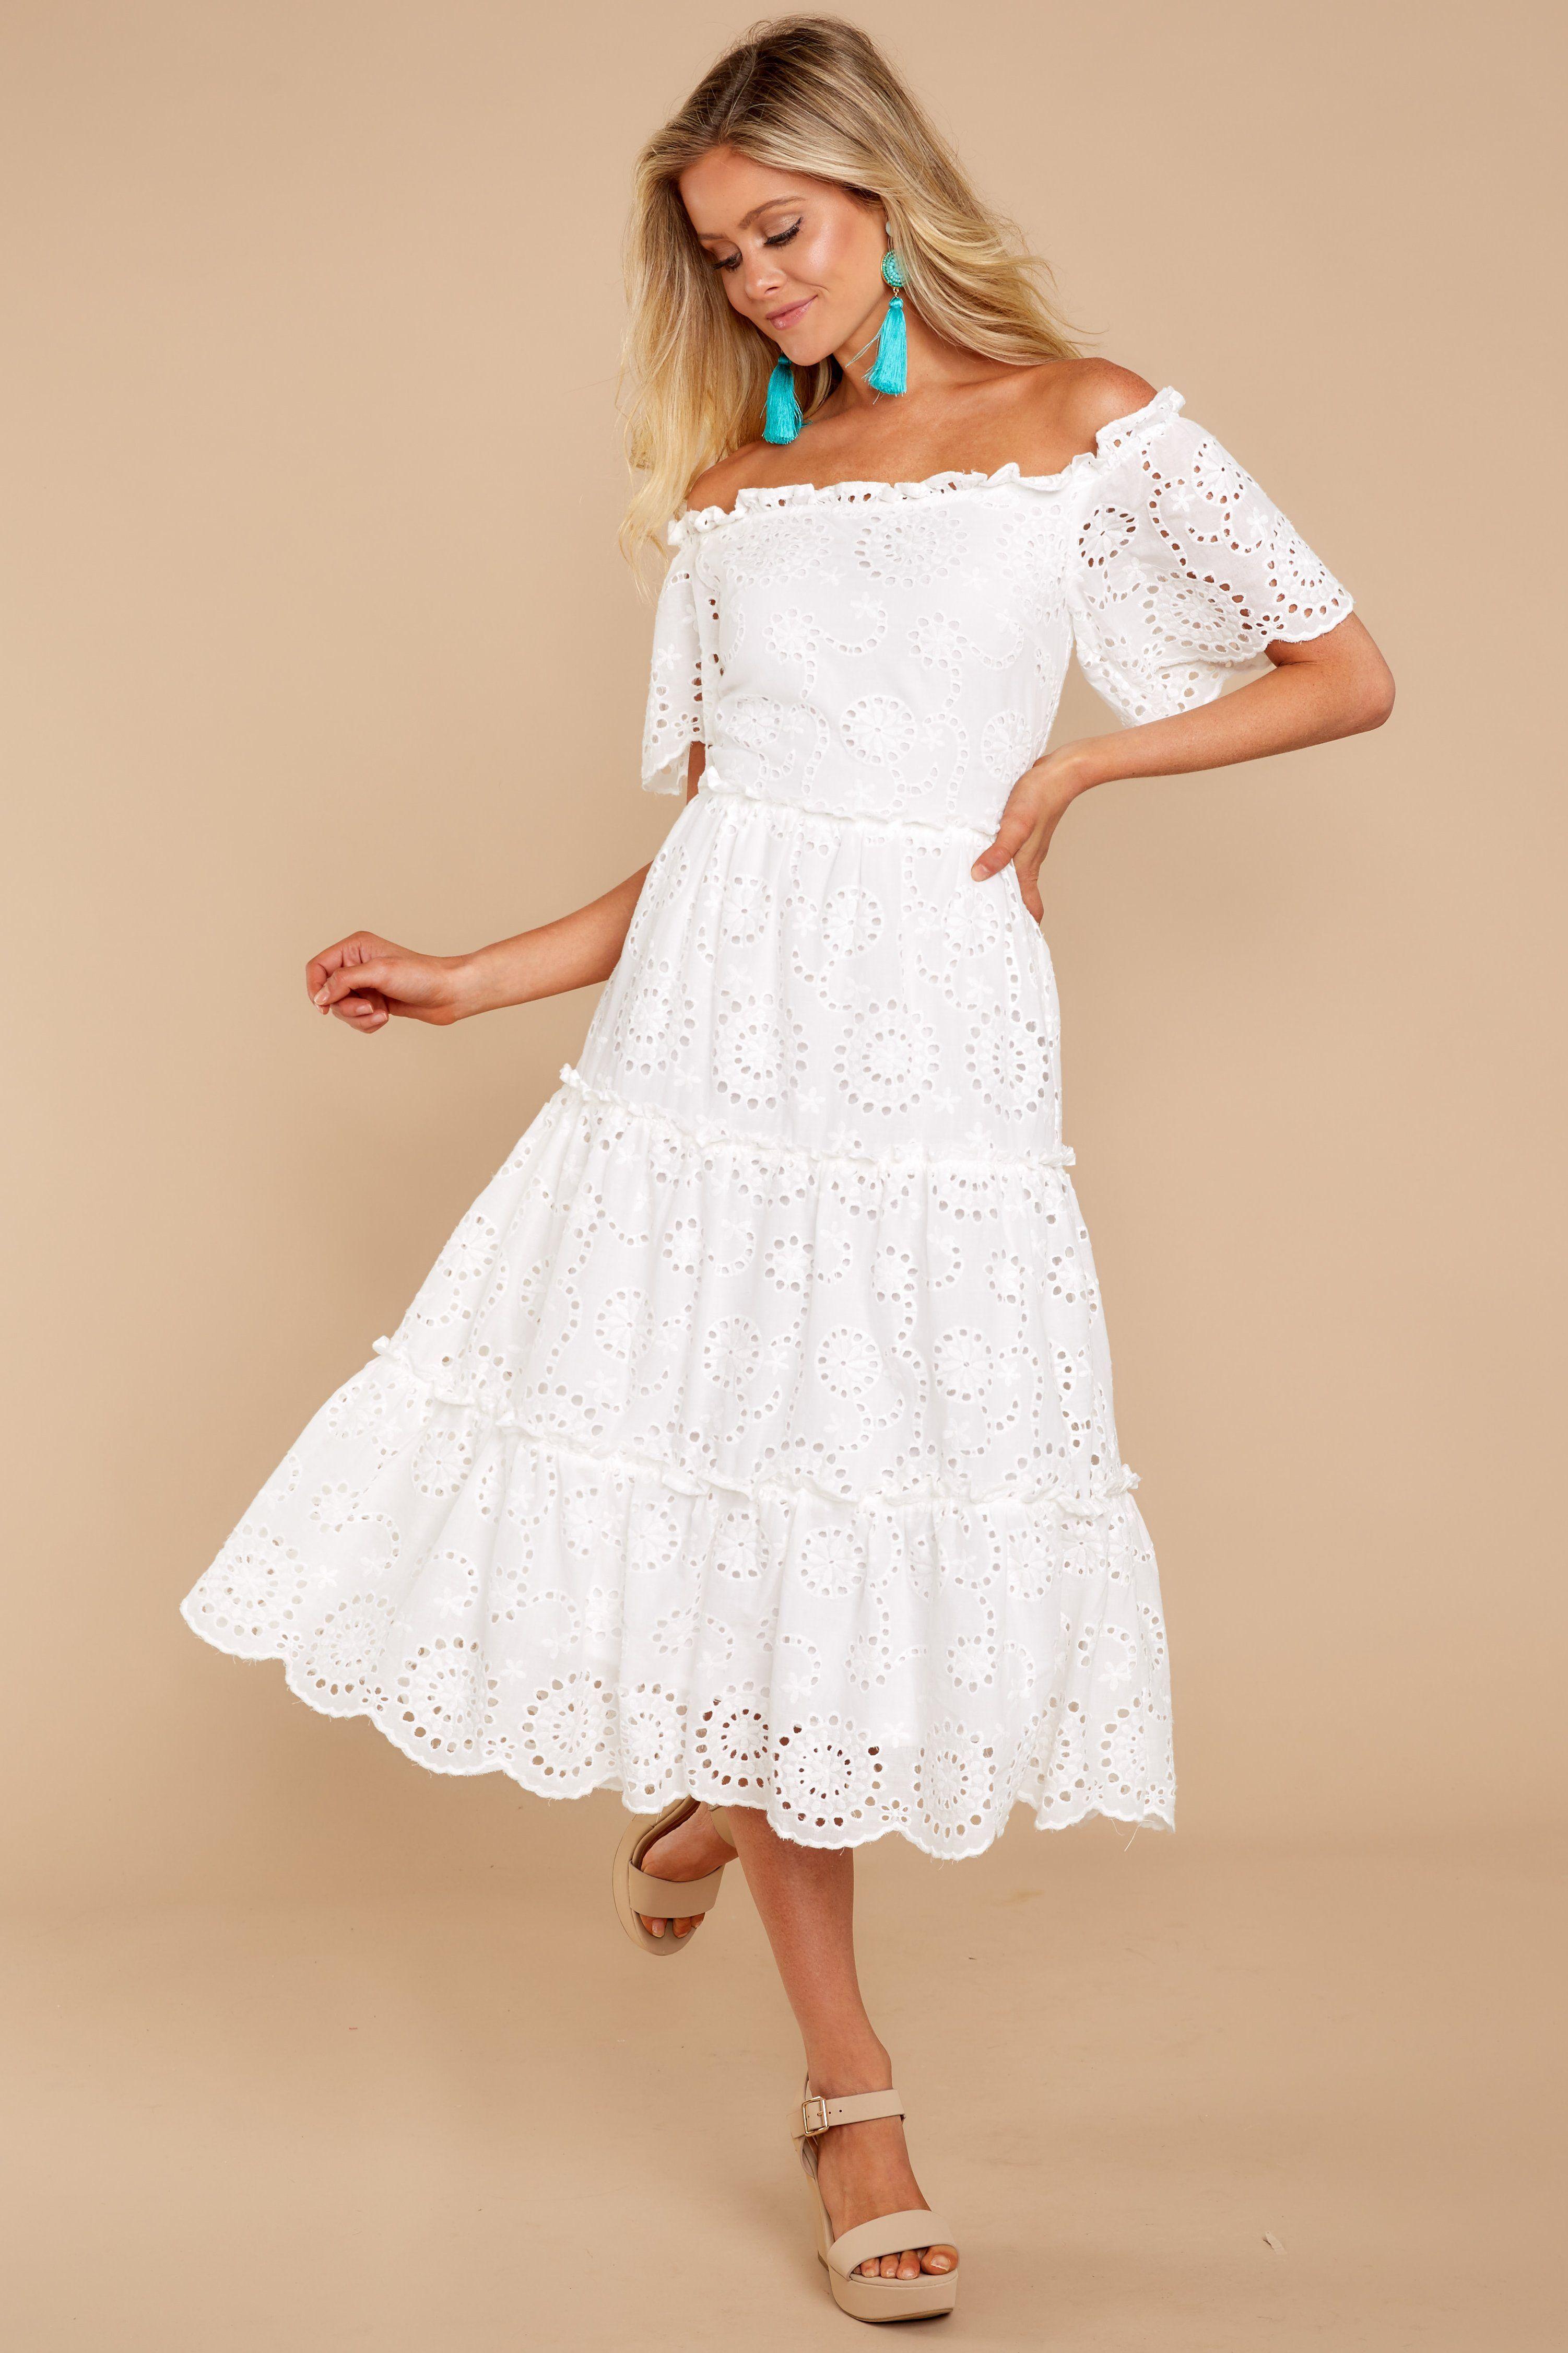 806d6b8b704 Chic White Eyelet Dress - Trendy Eyelet Dress - Dress -  64.00 – Red Dress  Boutique